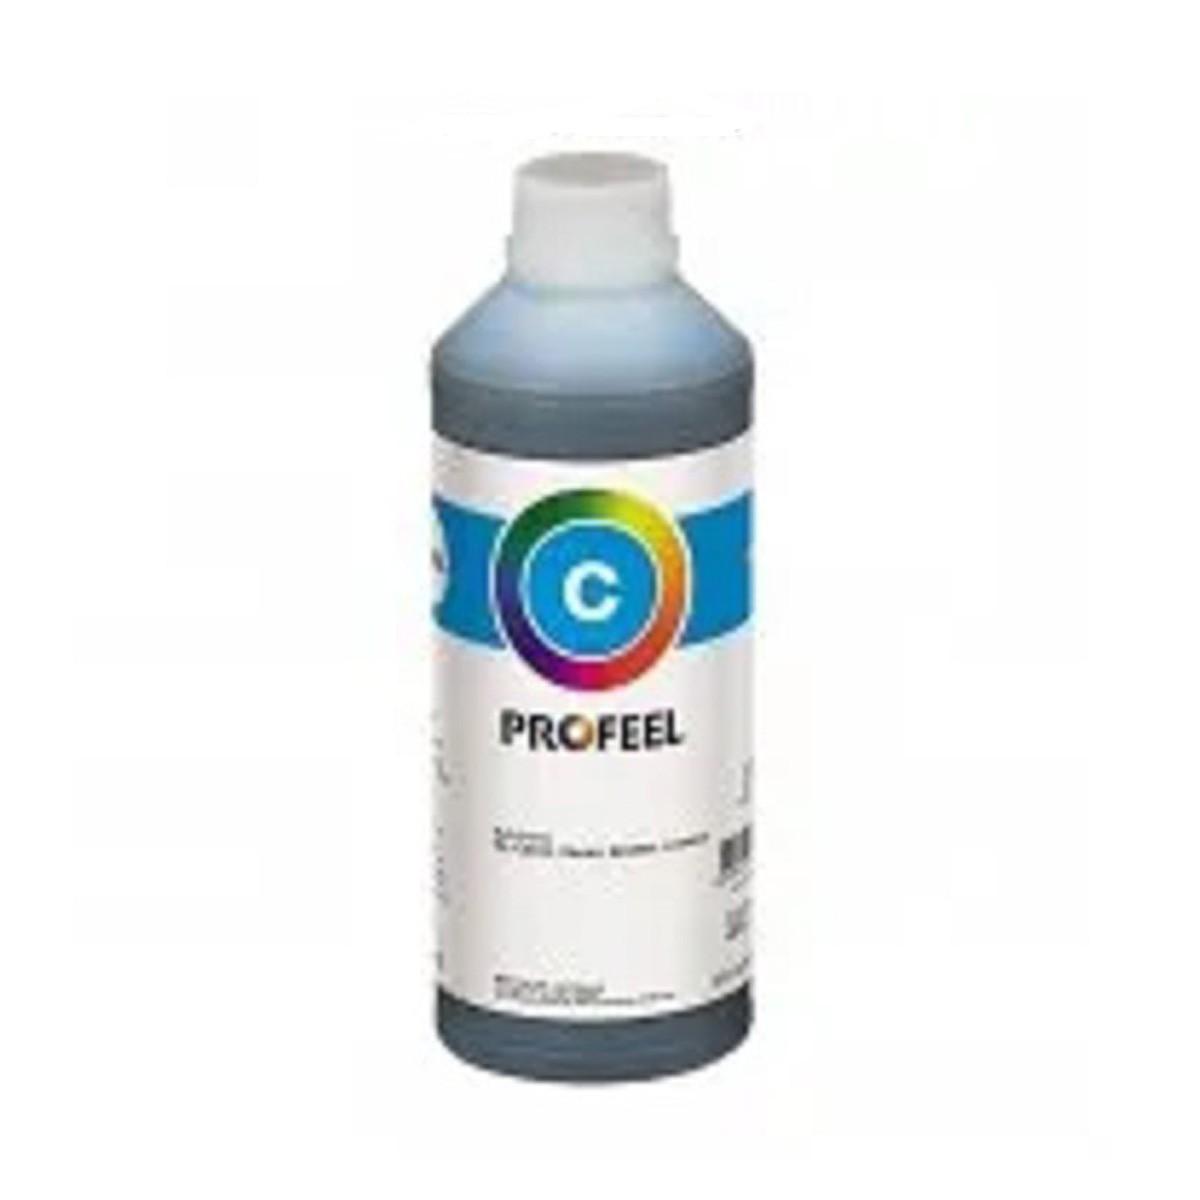 Tinta Epson Ciano Profeel Corante - 1 Litro